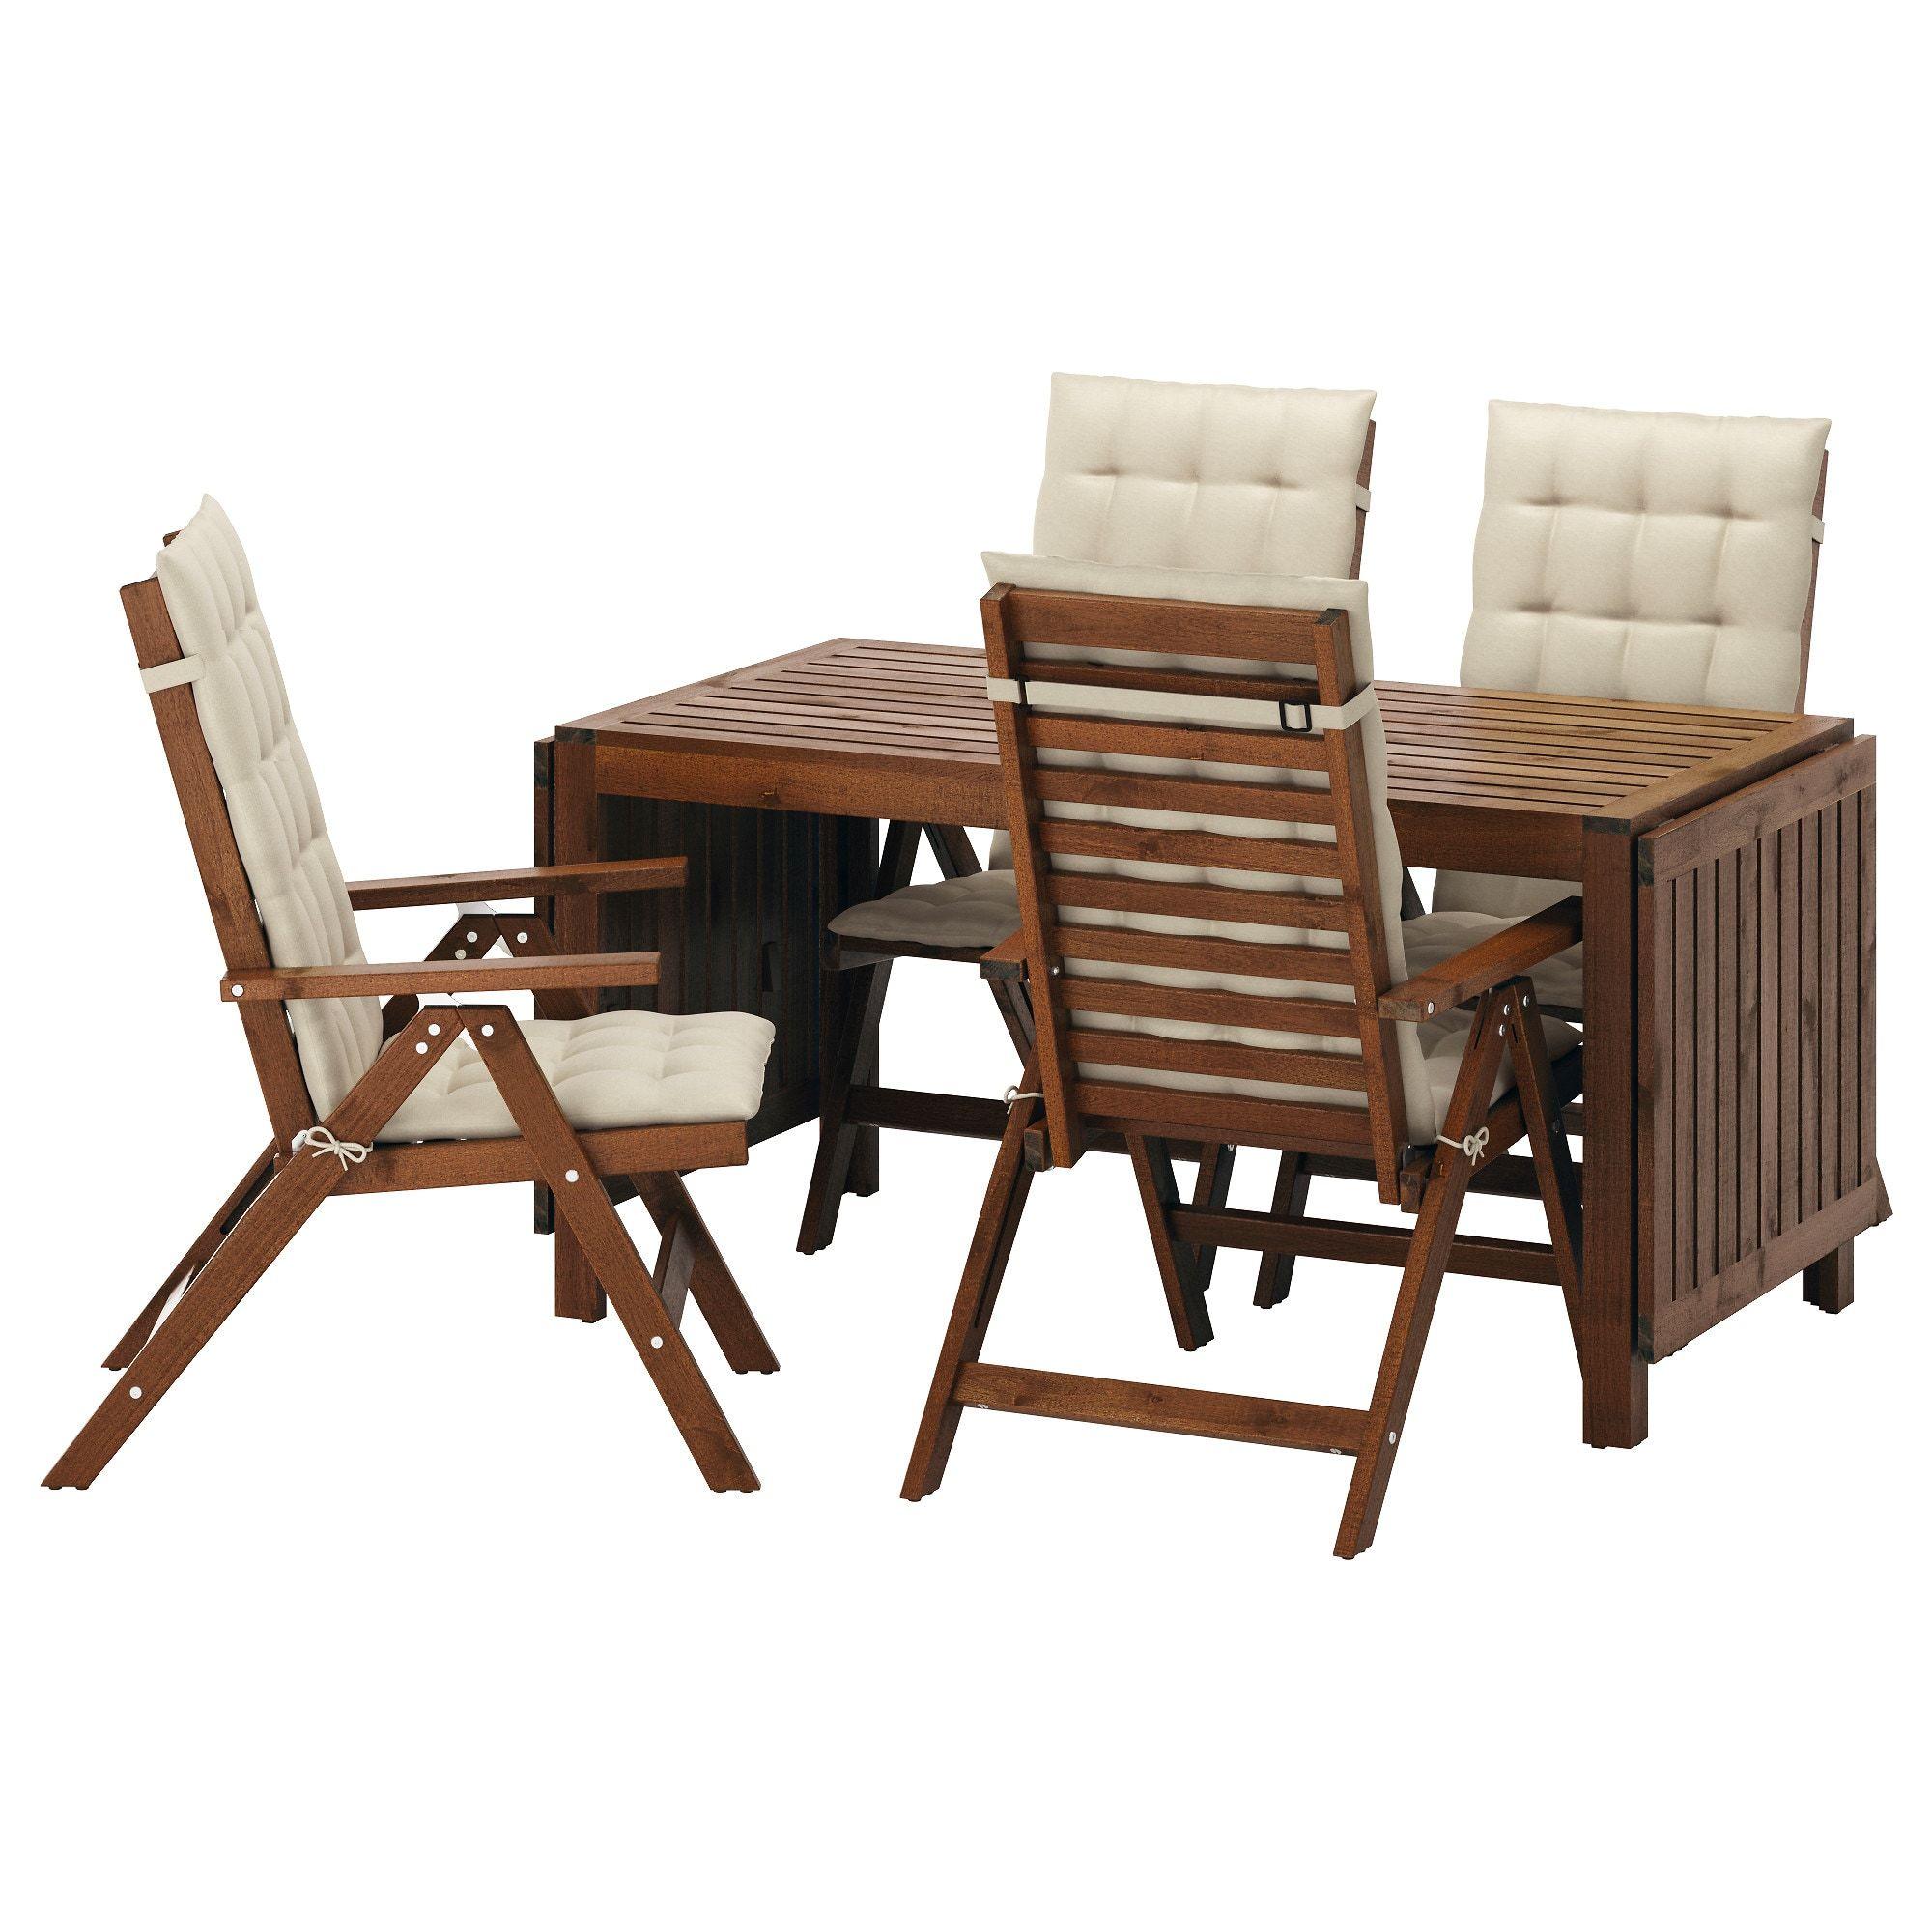 31+ Ikea applaro table cover ideas in 2021